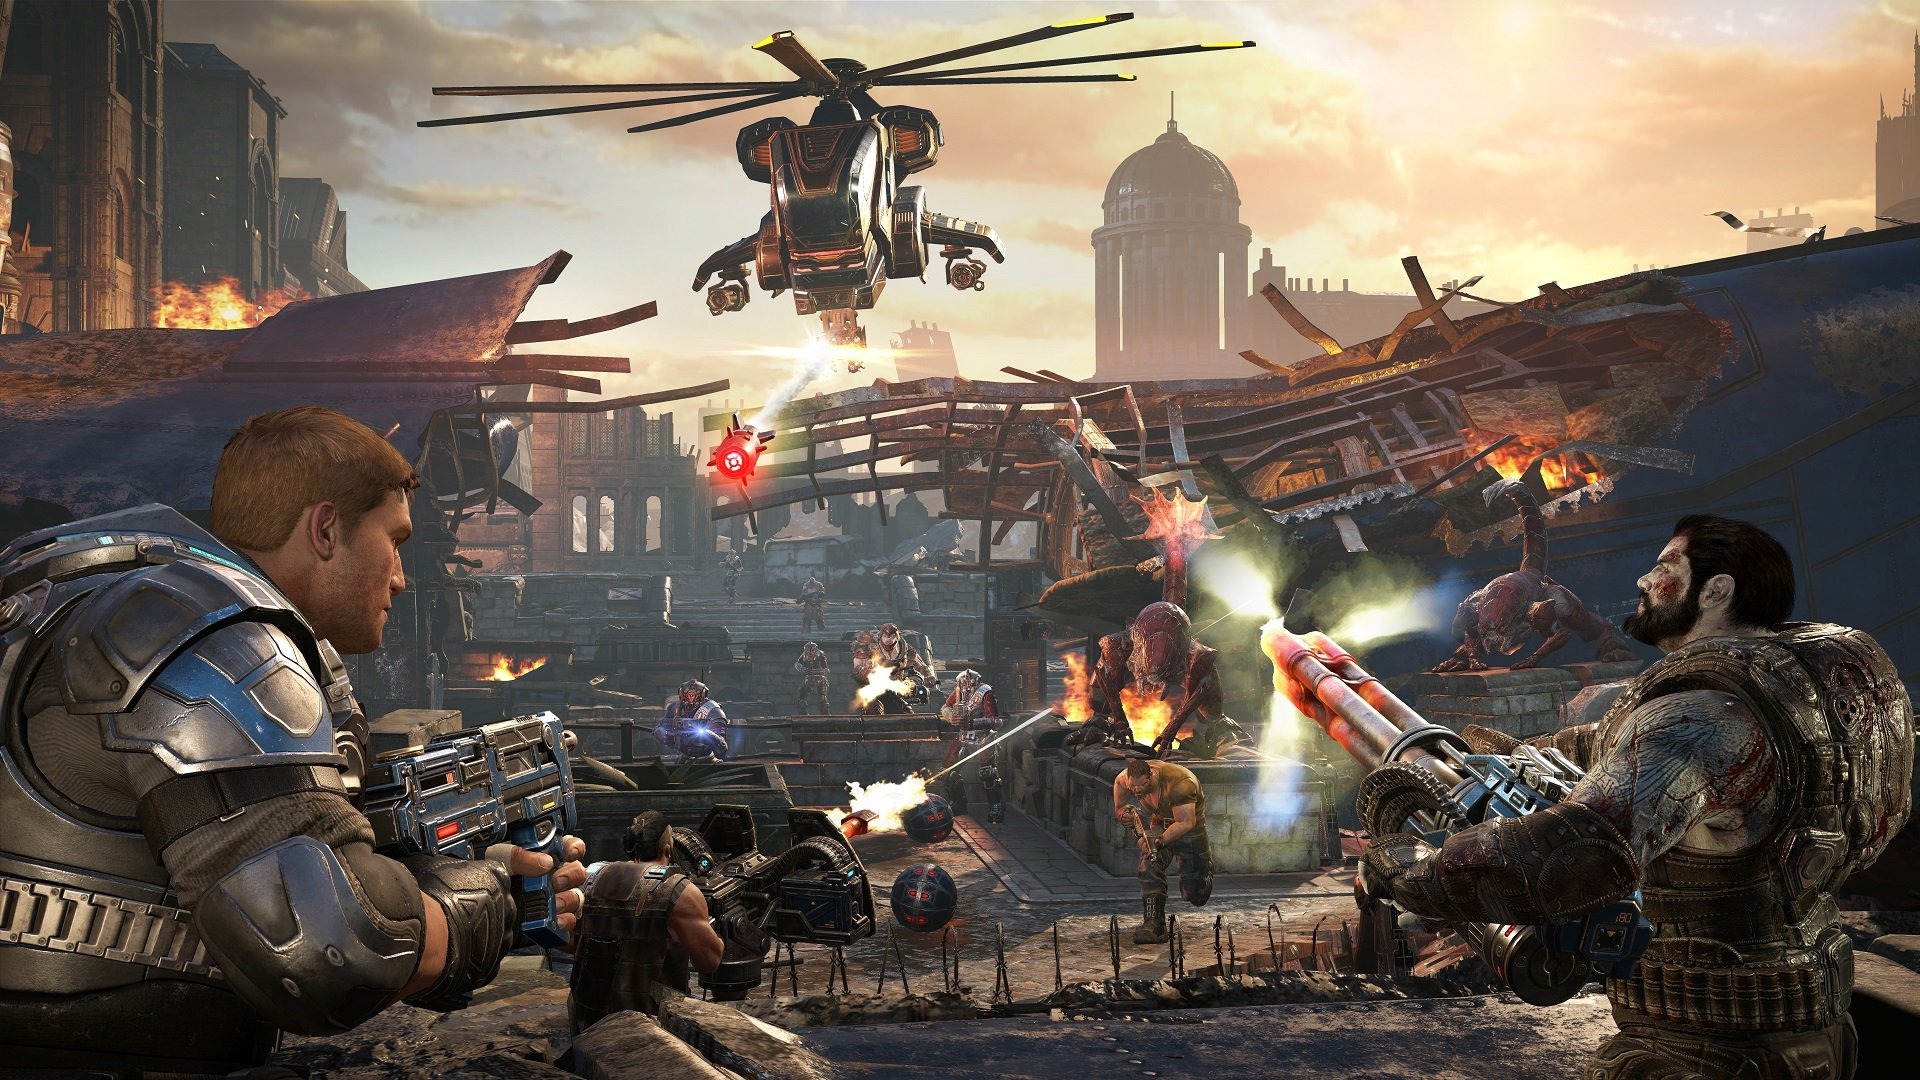 Скриншот к игре Gears of War 4 (2016) PC | Repack от R.G. Механики